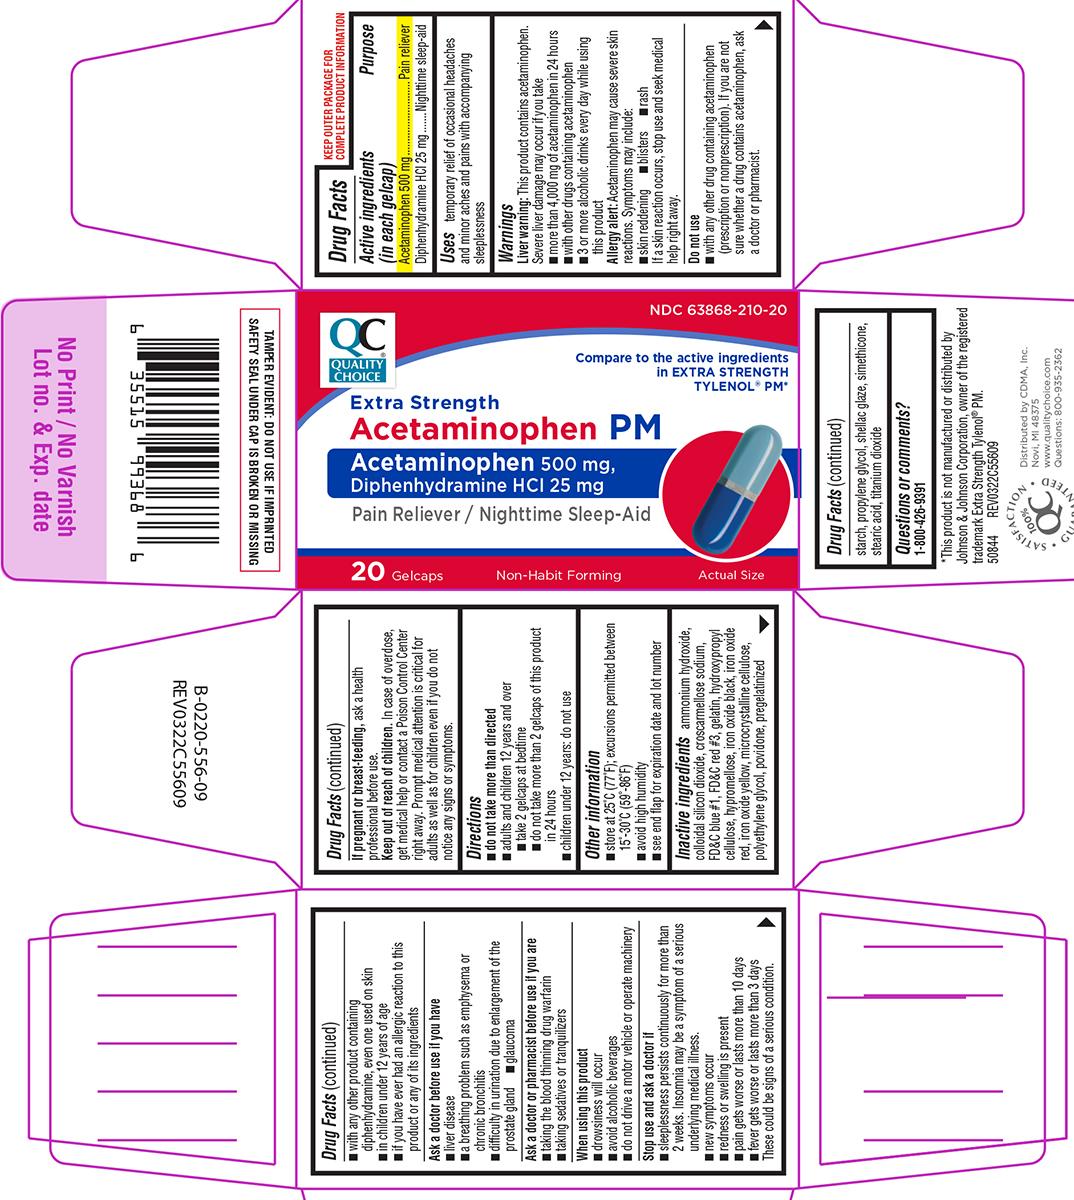 Acetaminophen Pm Extra Strength (Acetaminophen, Diphenhydramine Hcl) Tablet [Chain Drug Marketing Association Inc]